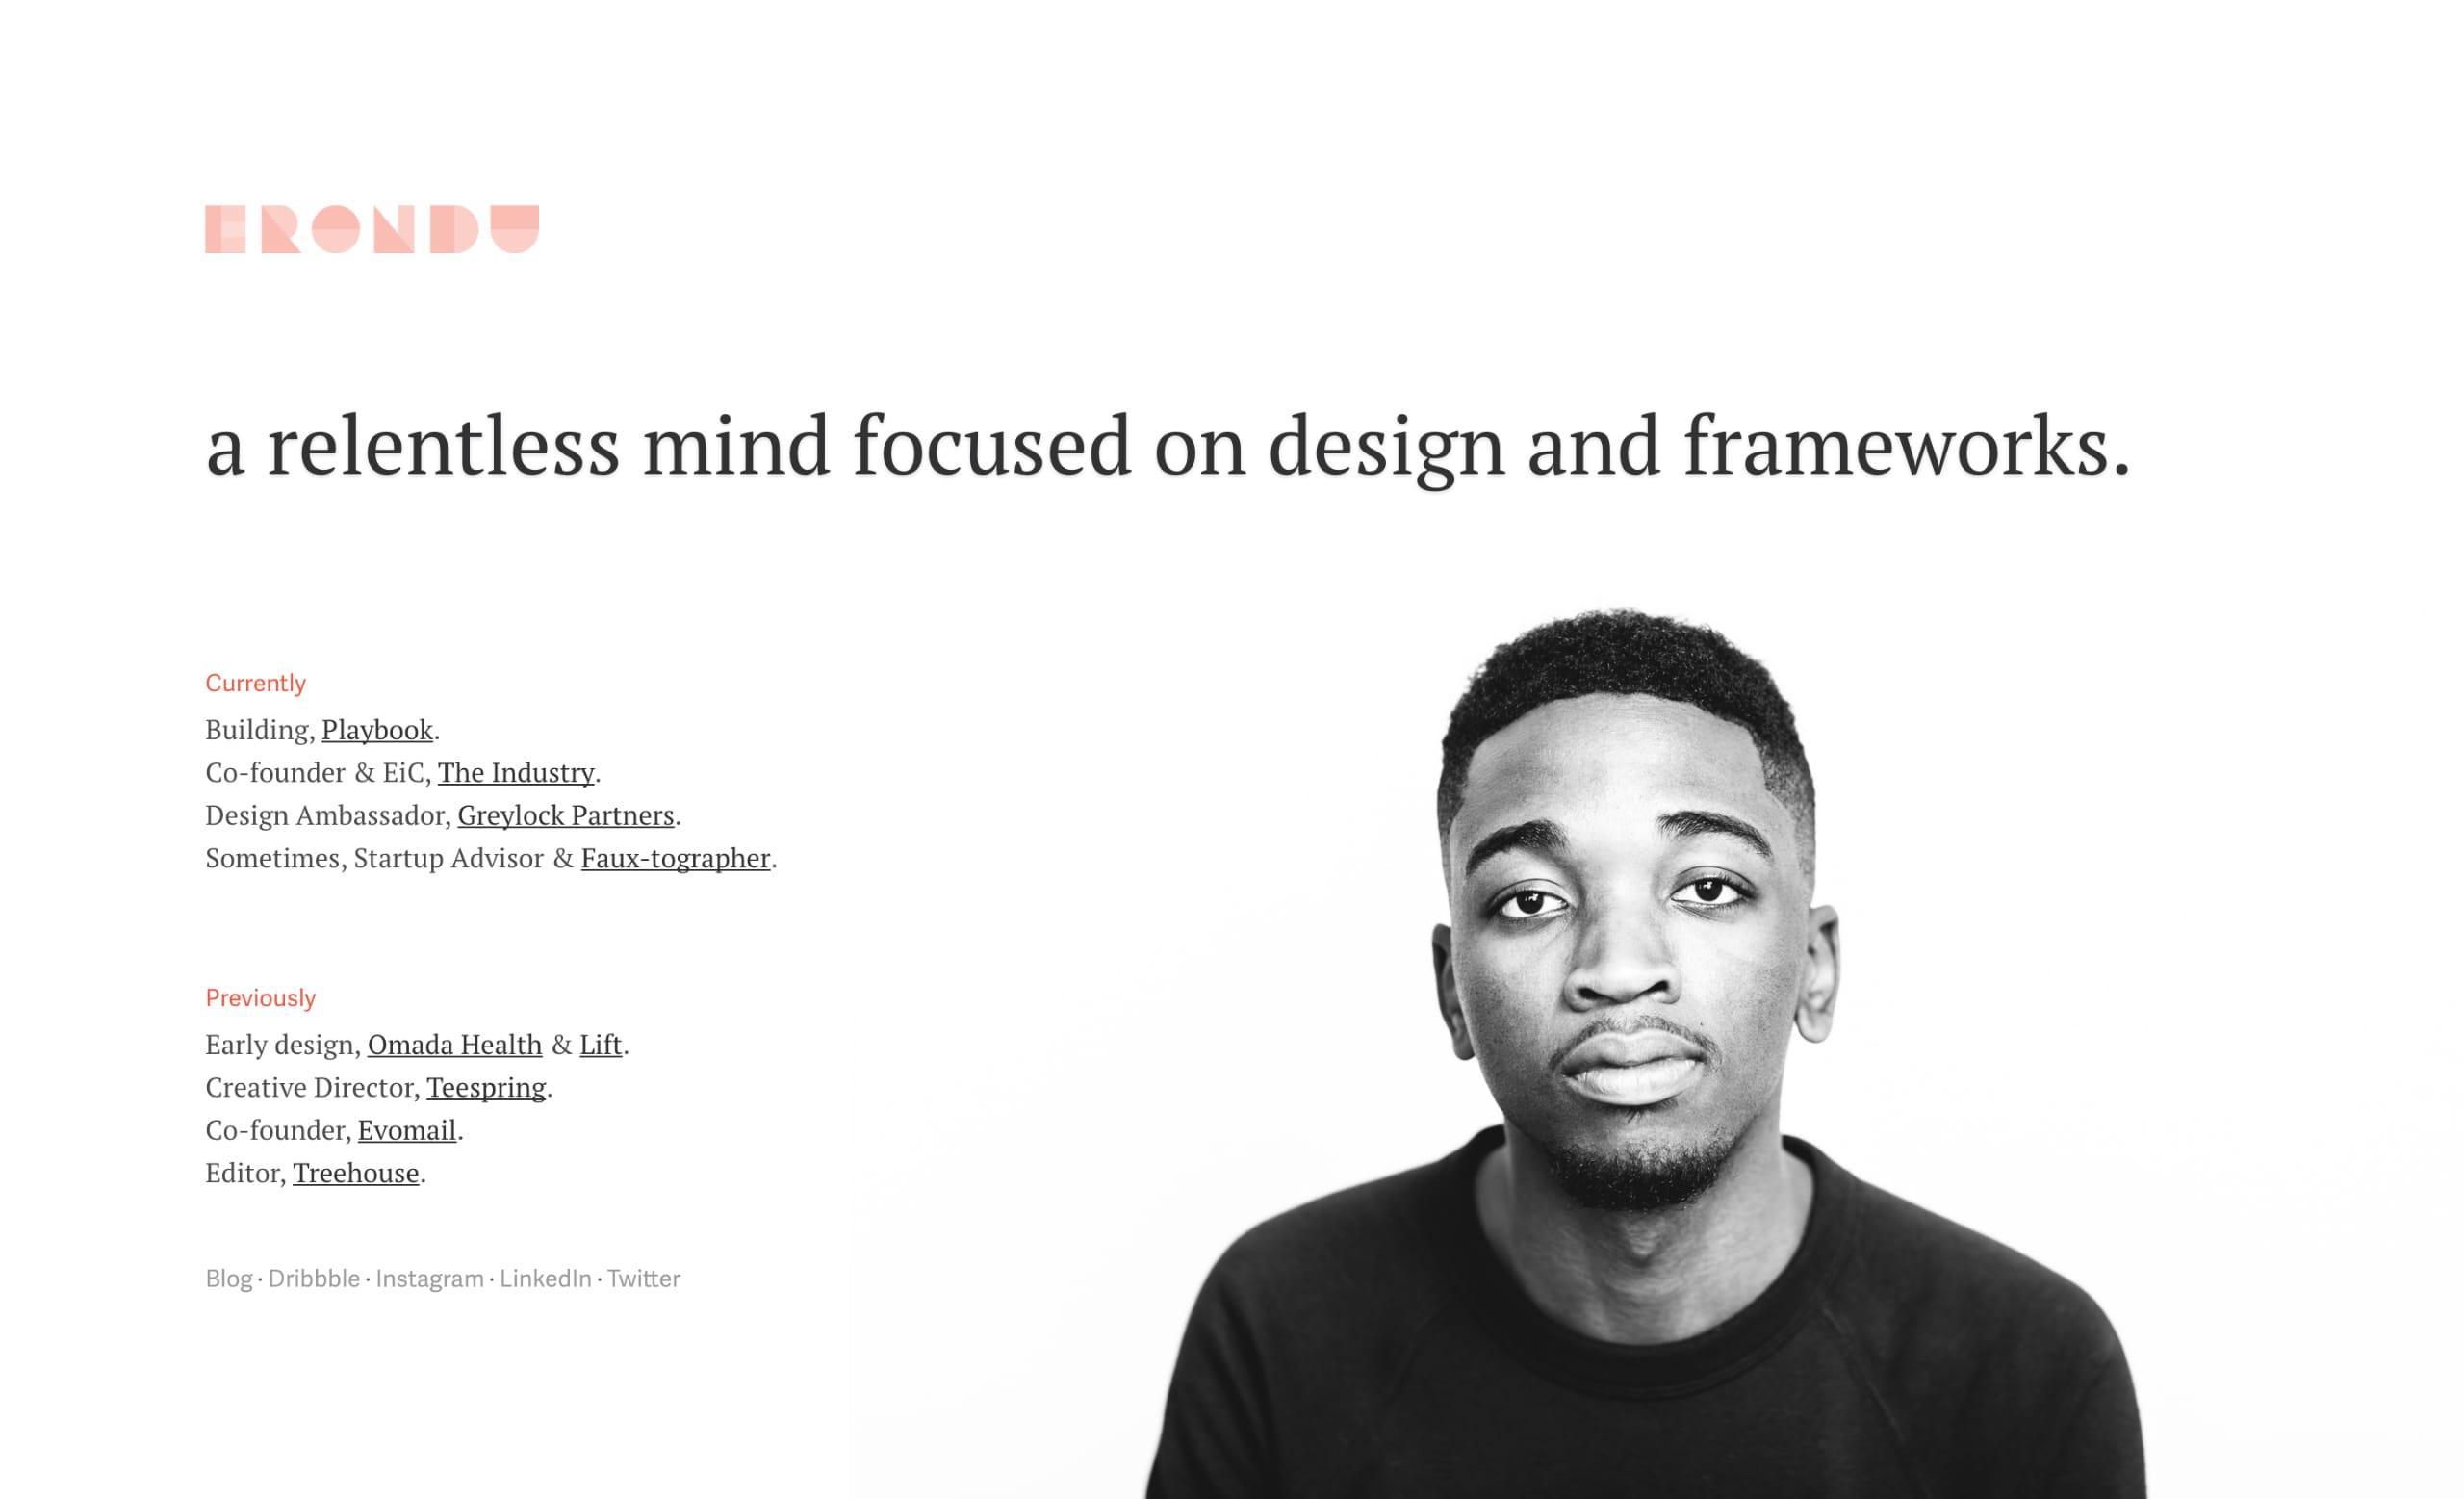 Jared Erondu Website Screenshot